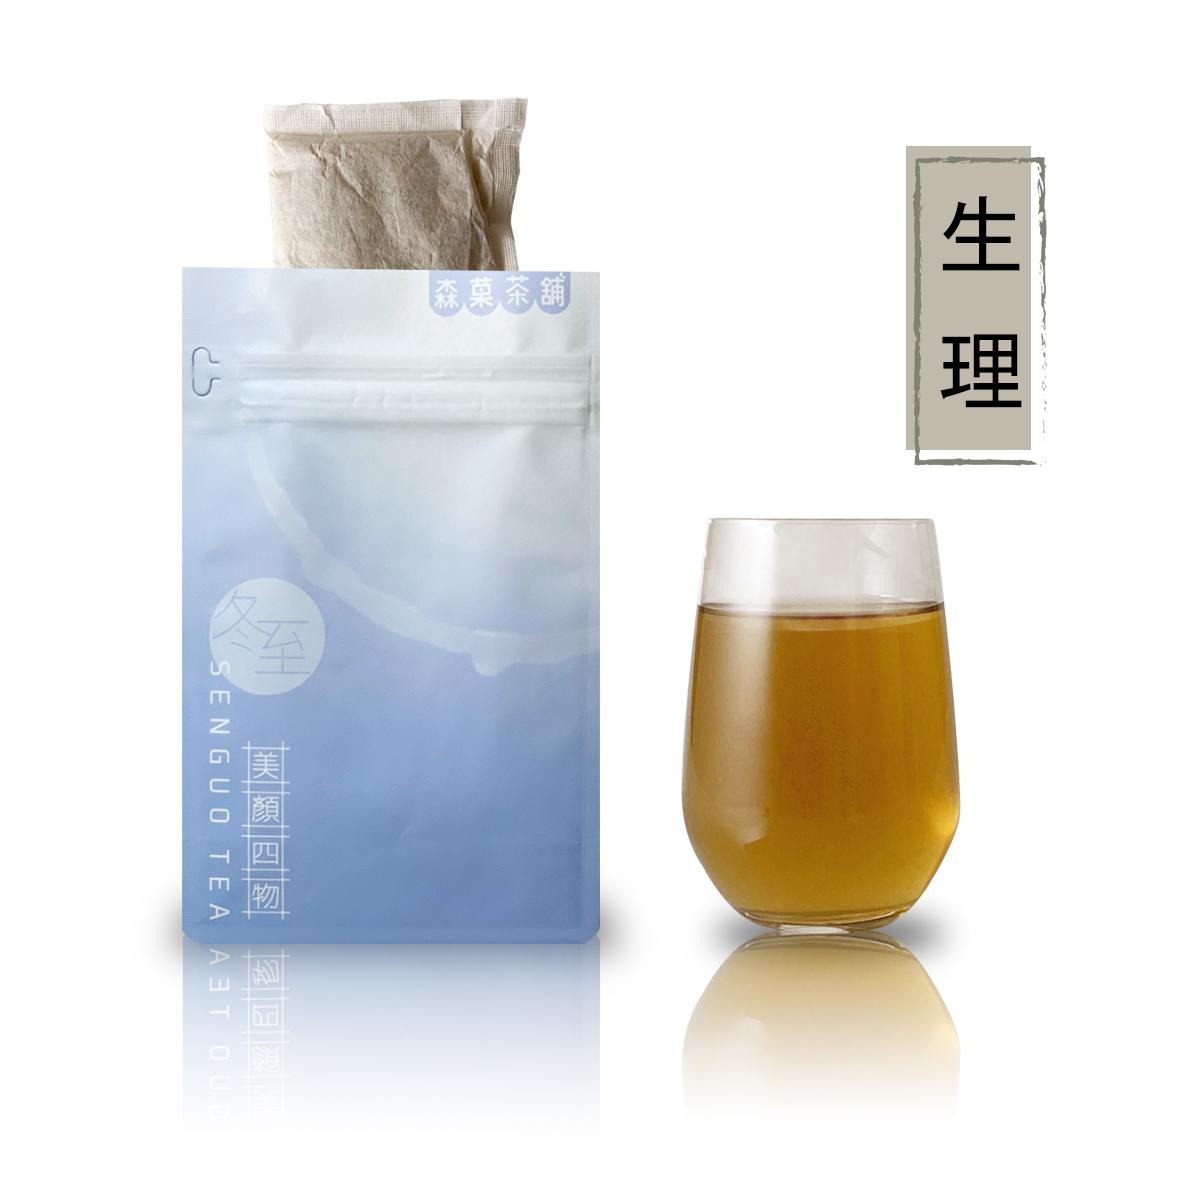 Senguo 美肌四物湯 10パック 冷え症 生理不順 漢方 健康茶 期間限定送料無料 美容茶 健康飲料 ドリンク 茶葉 台湾直送 飲み物 ティーバック ファクトリーアウトレット senguo